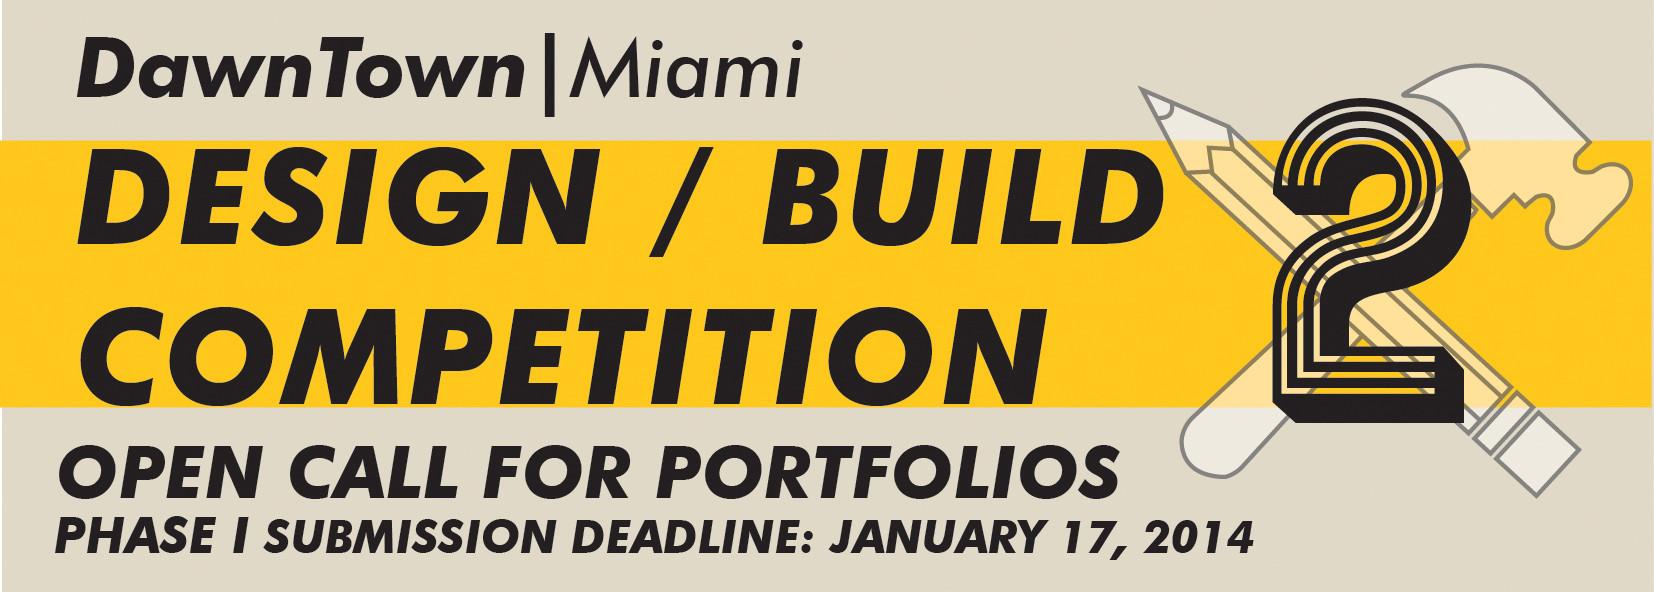 DawnTown Announces 2nd Design/Build Competition